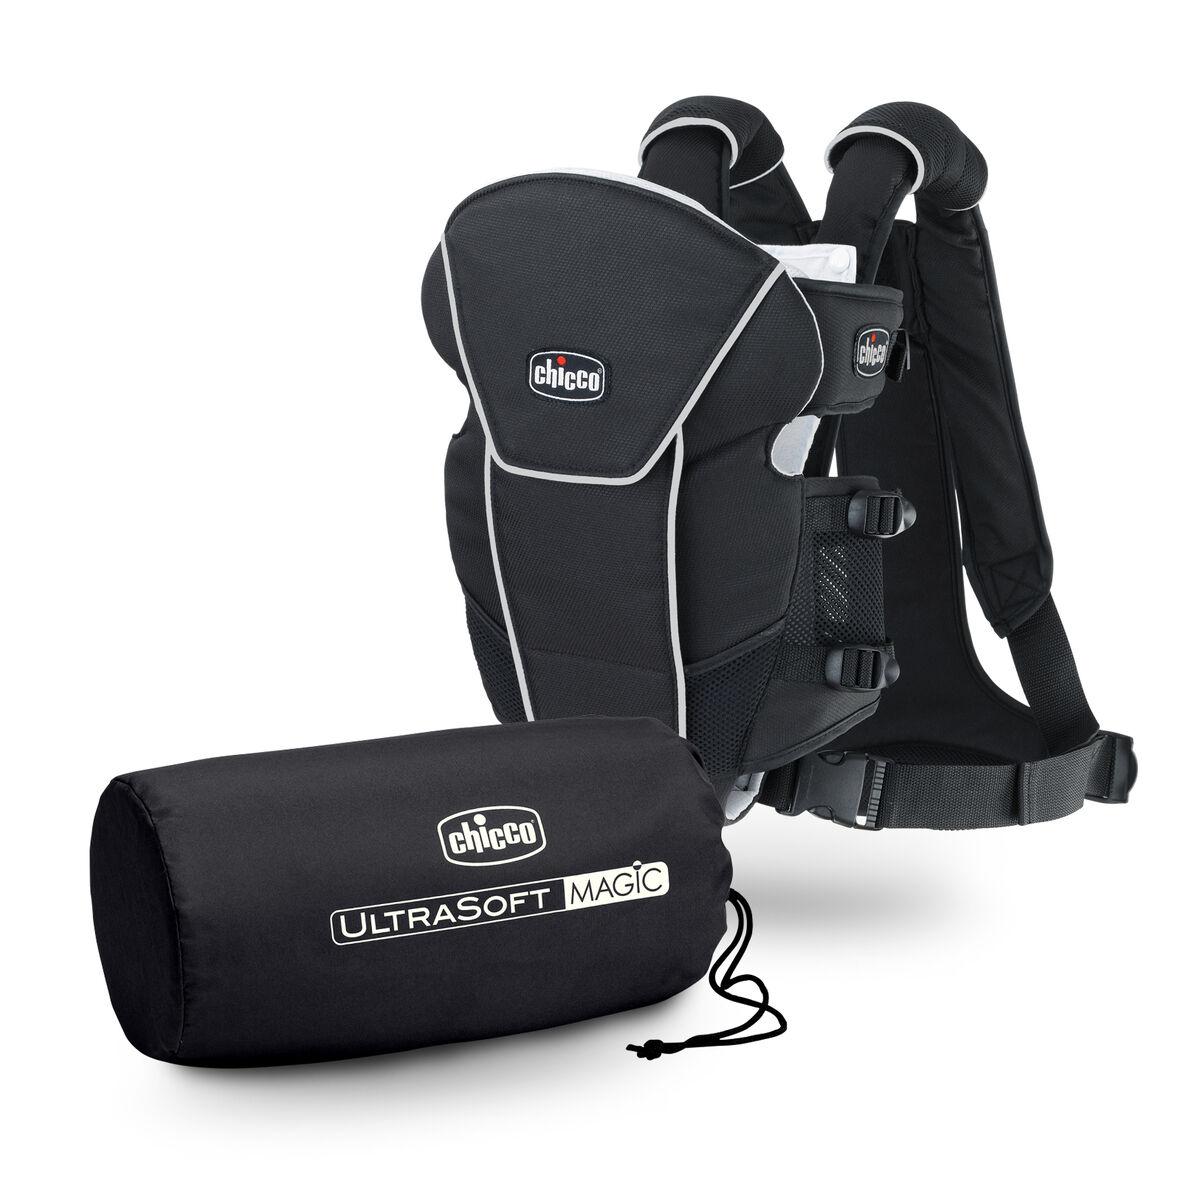 Chicco Ultrasoft Magic Infant Carrier Black